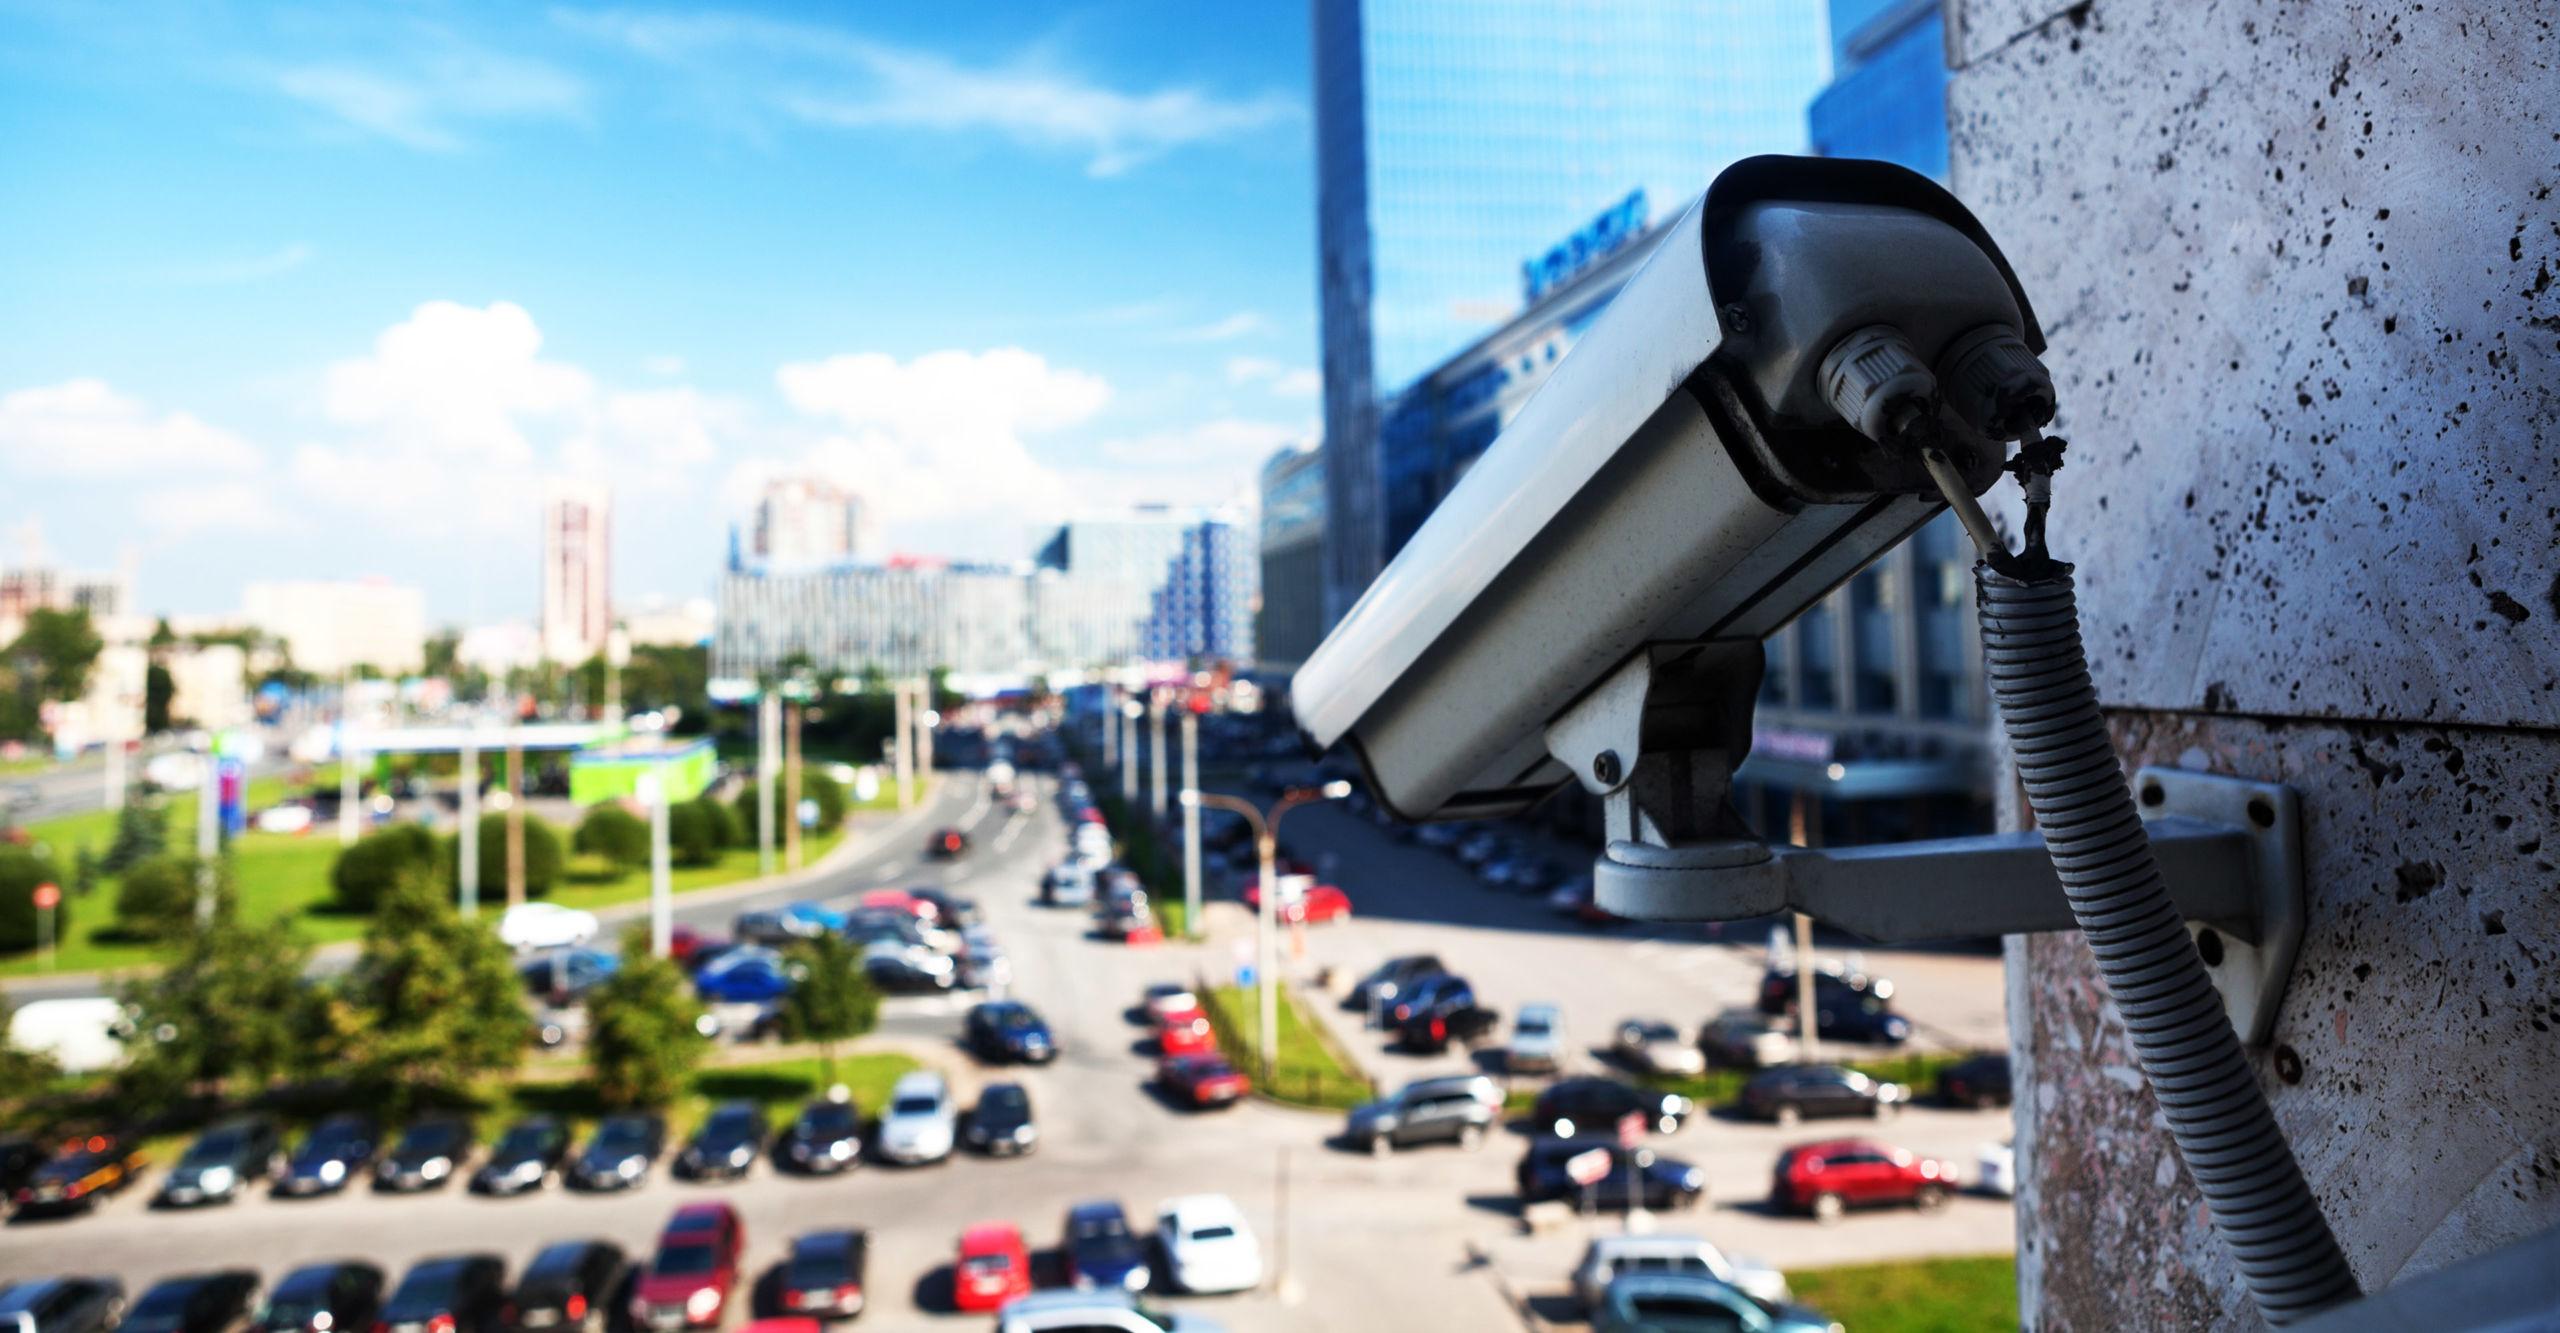 Vaxtor Building Security - ALPR Cameras